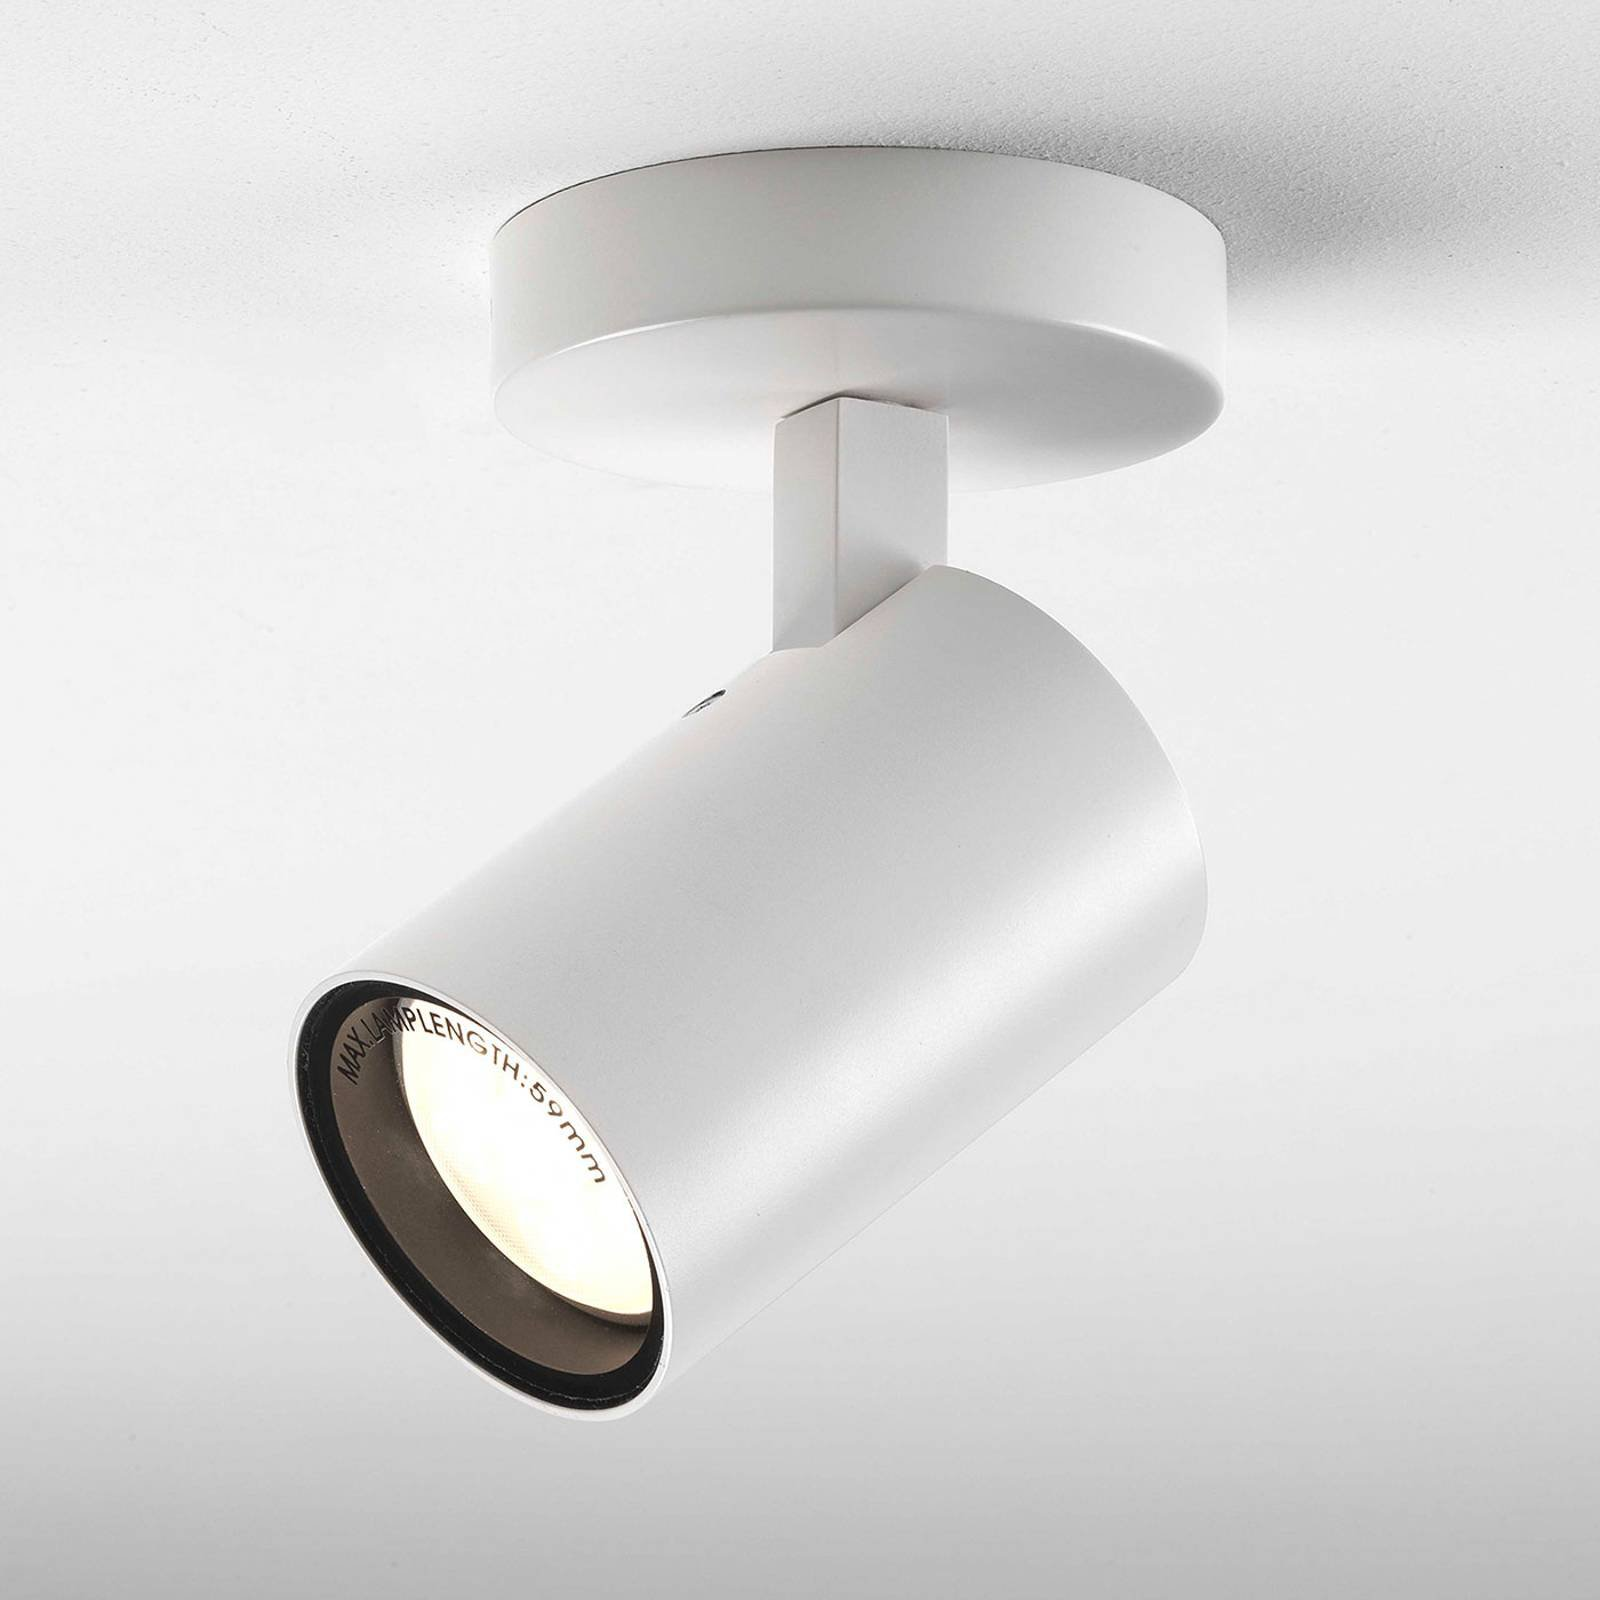 Astro Aqua Single LED-taklampe til bad, hvit